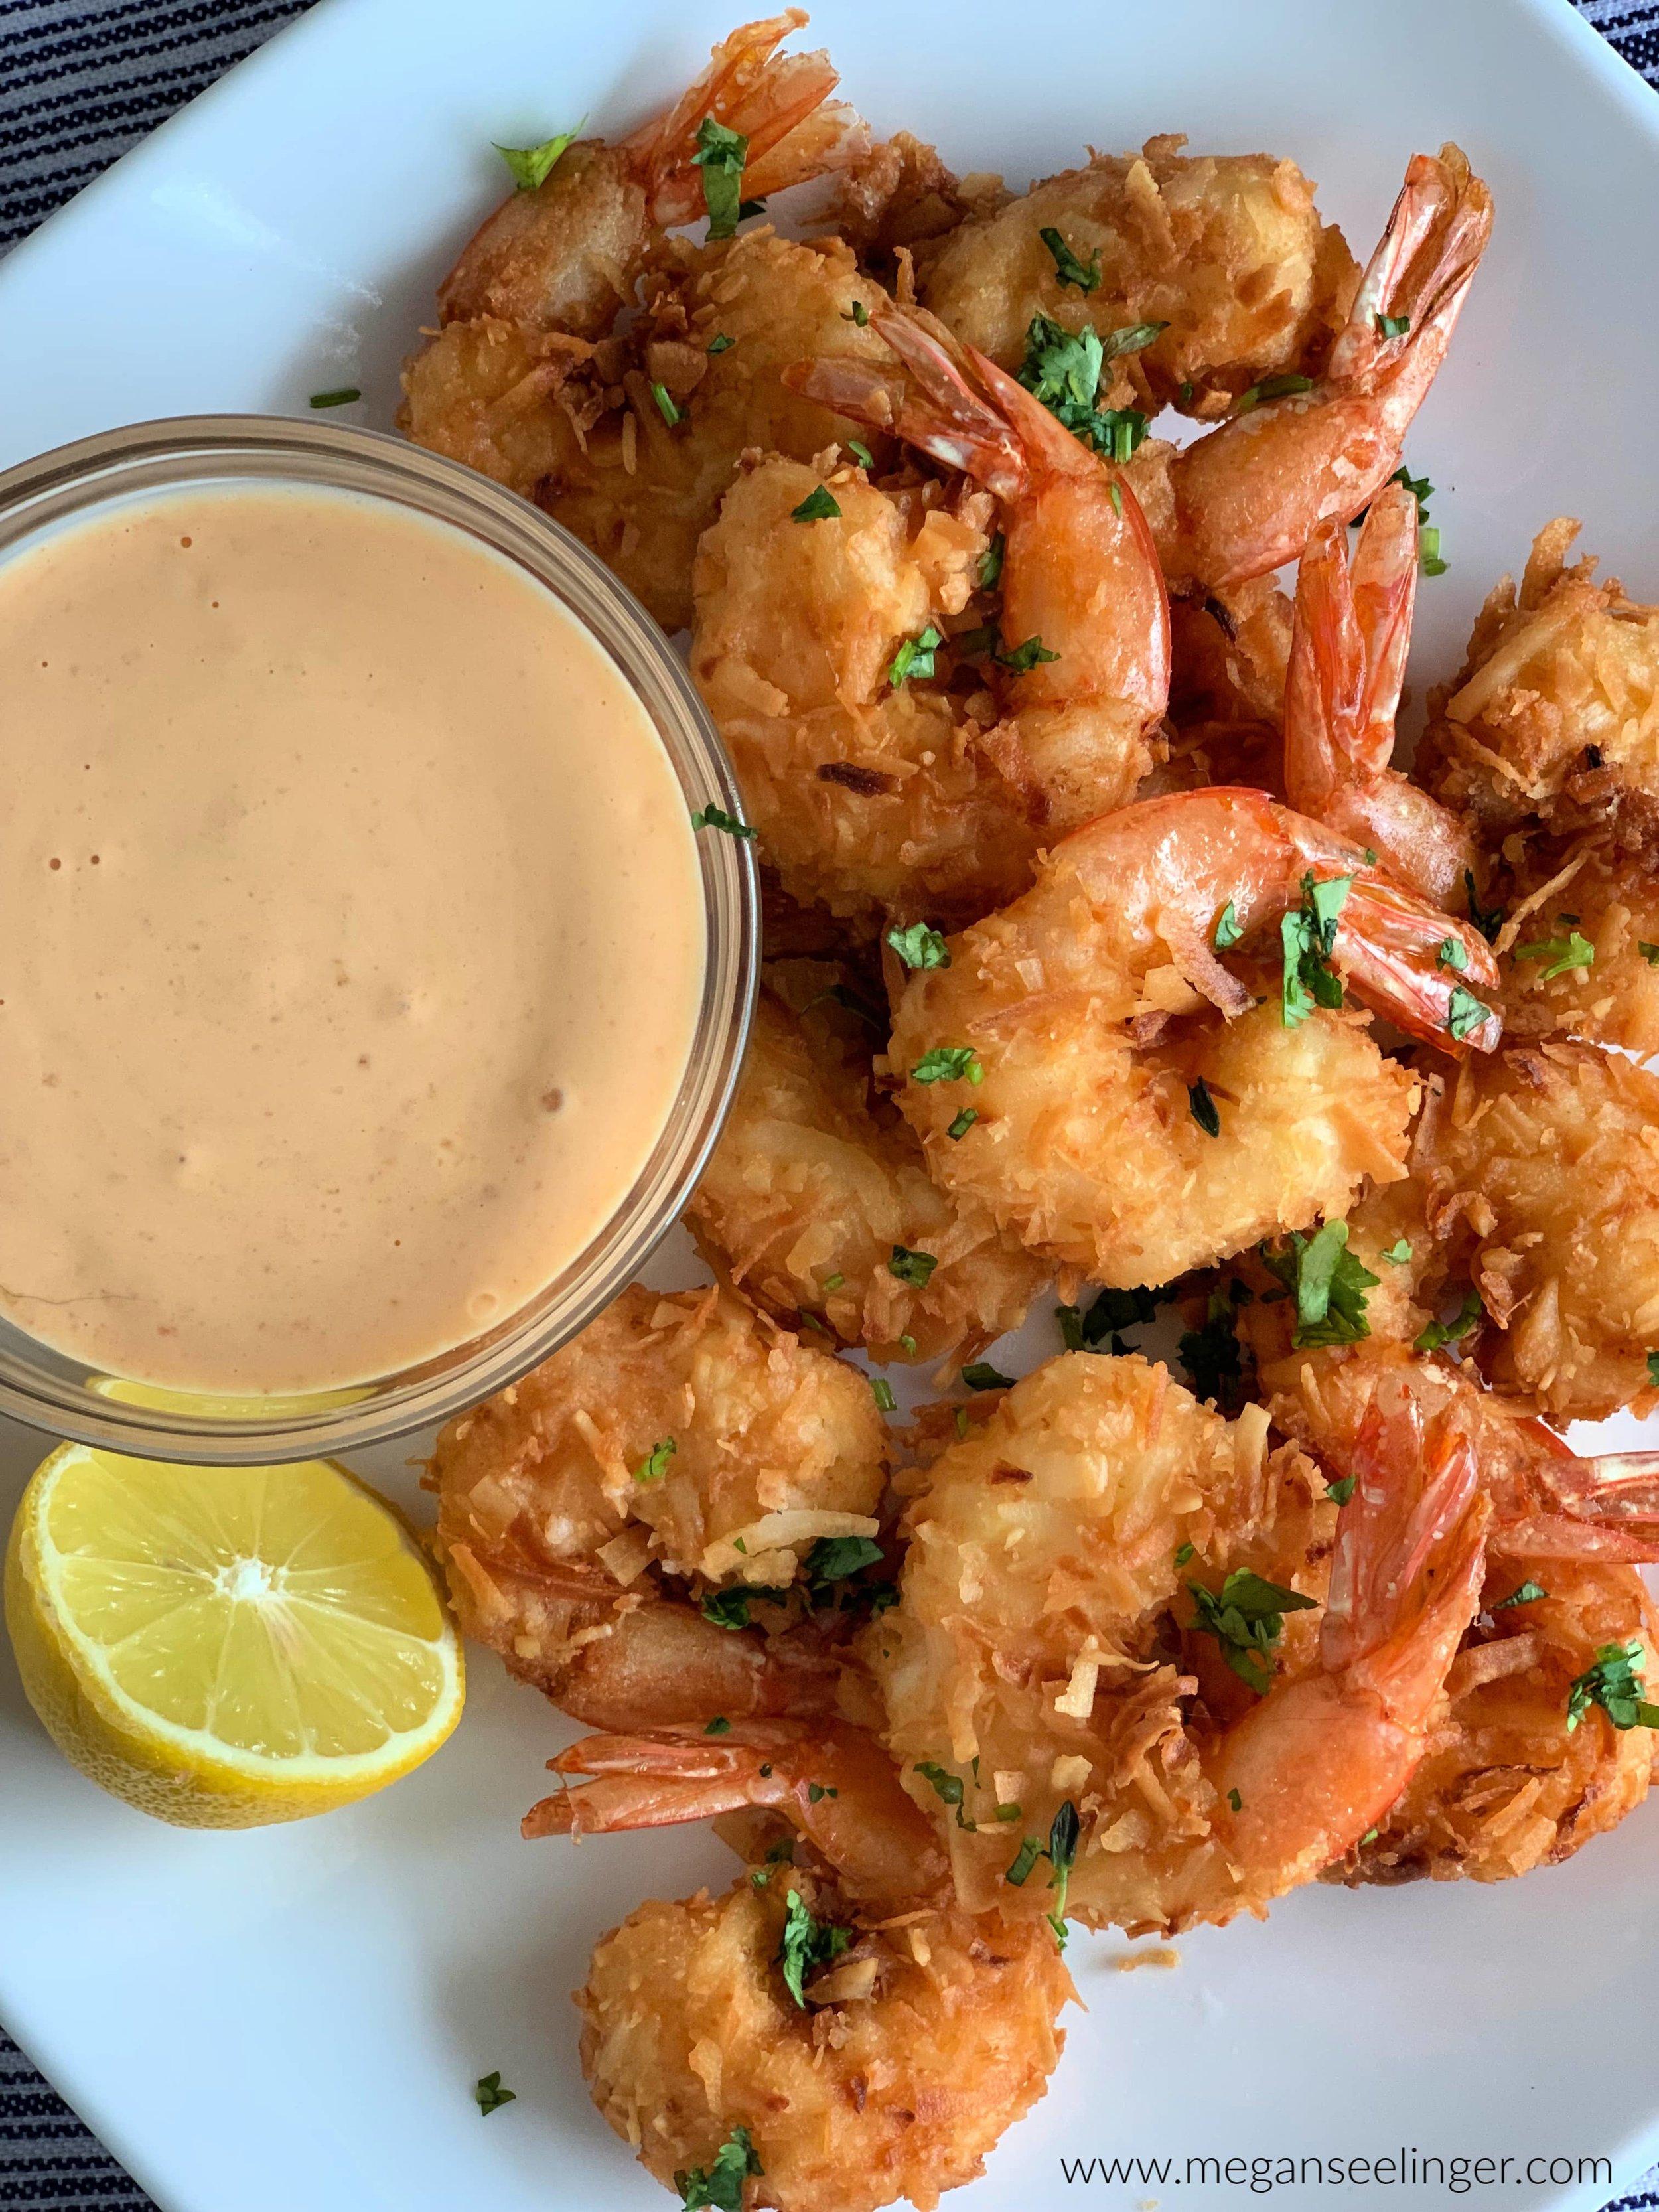 Easy Keto Fried Coconut Shrimp - Pan Fried or Air Fryer Shrimp